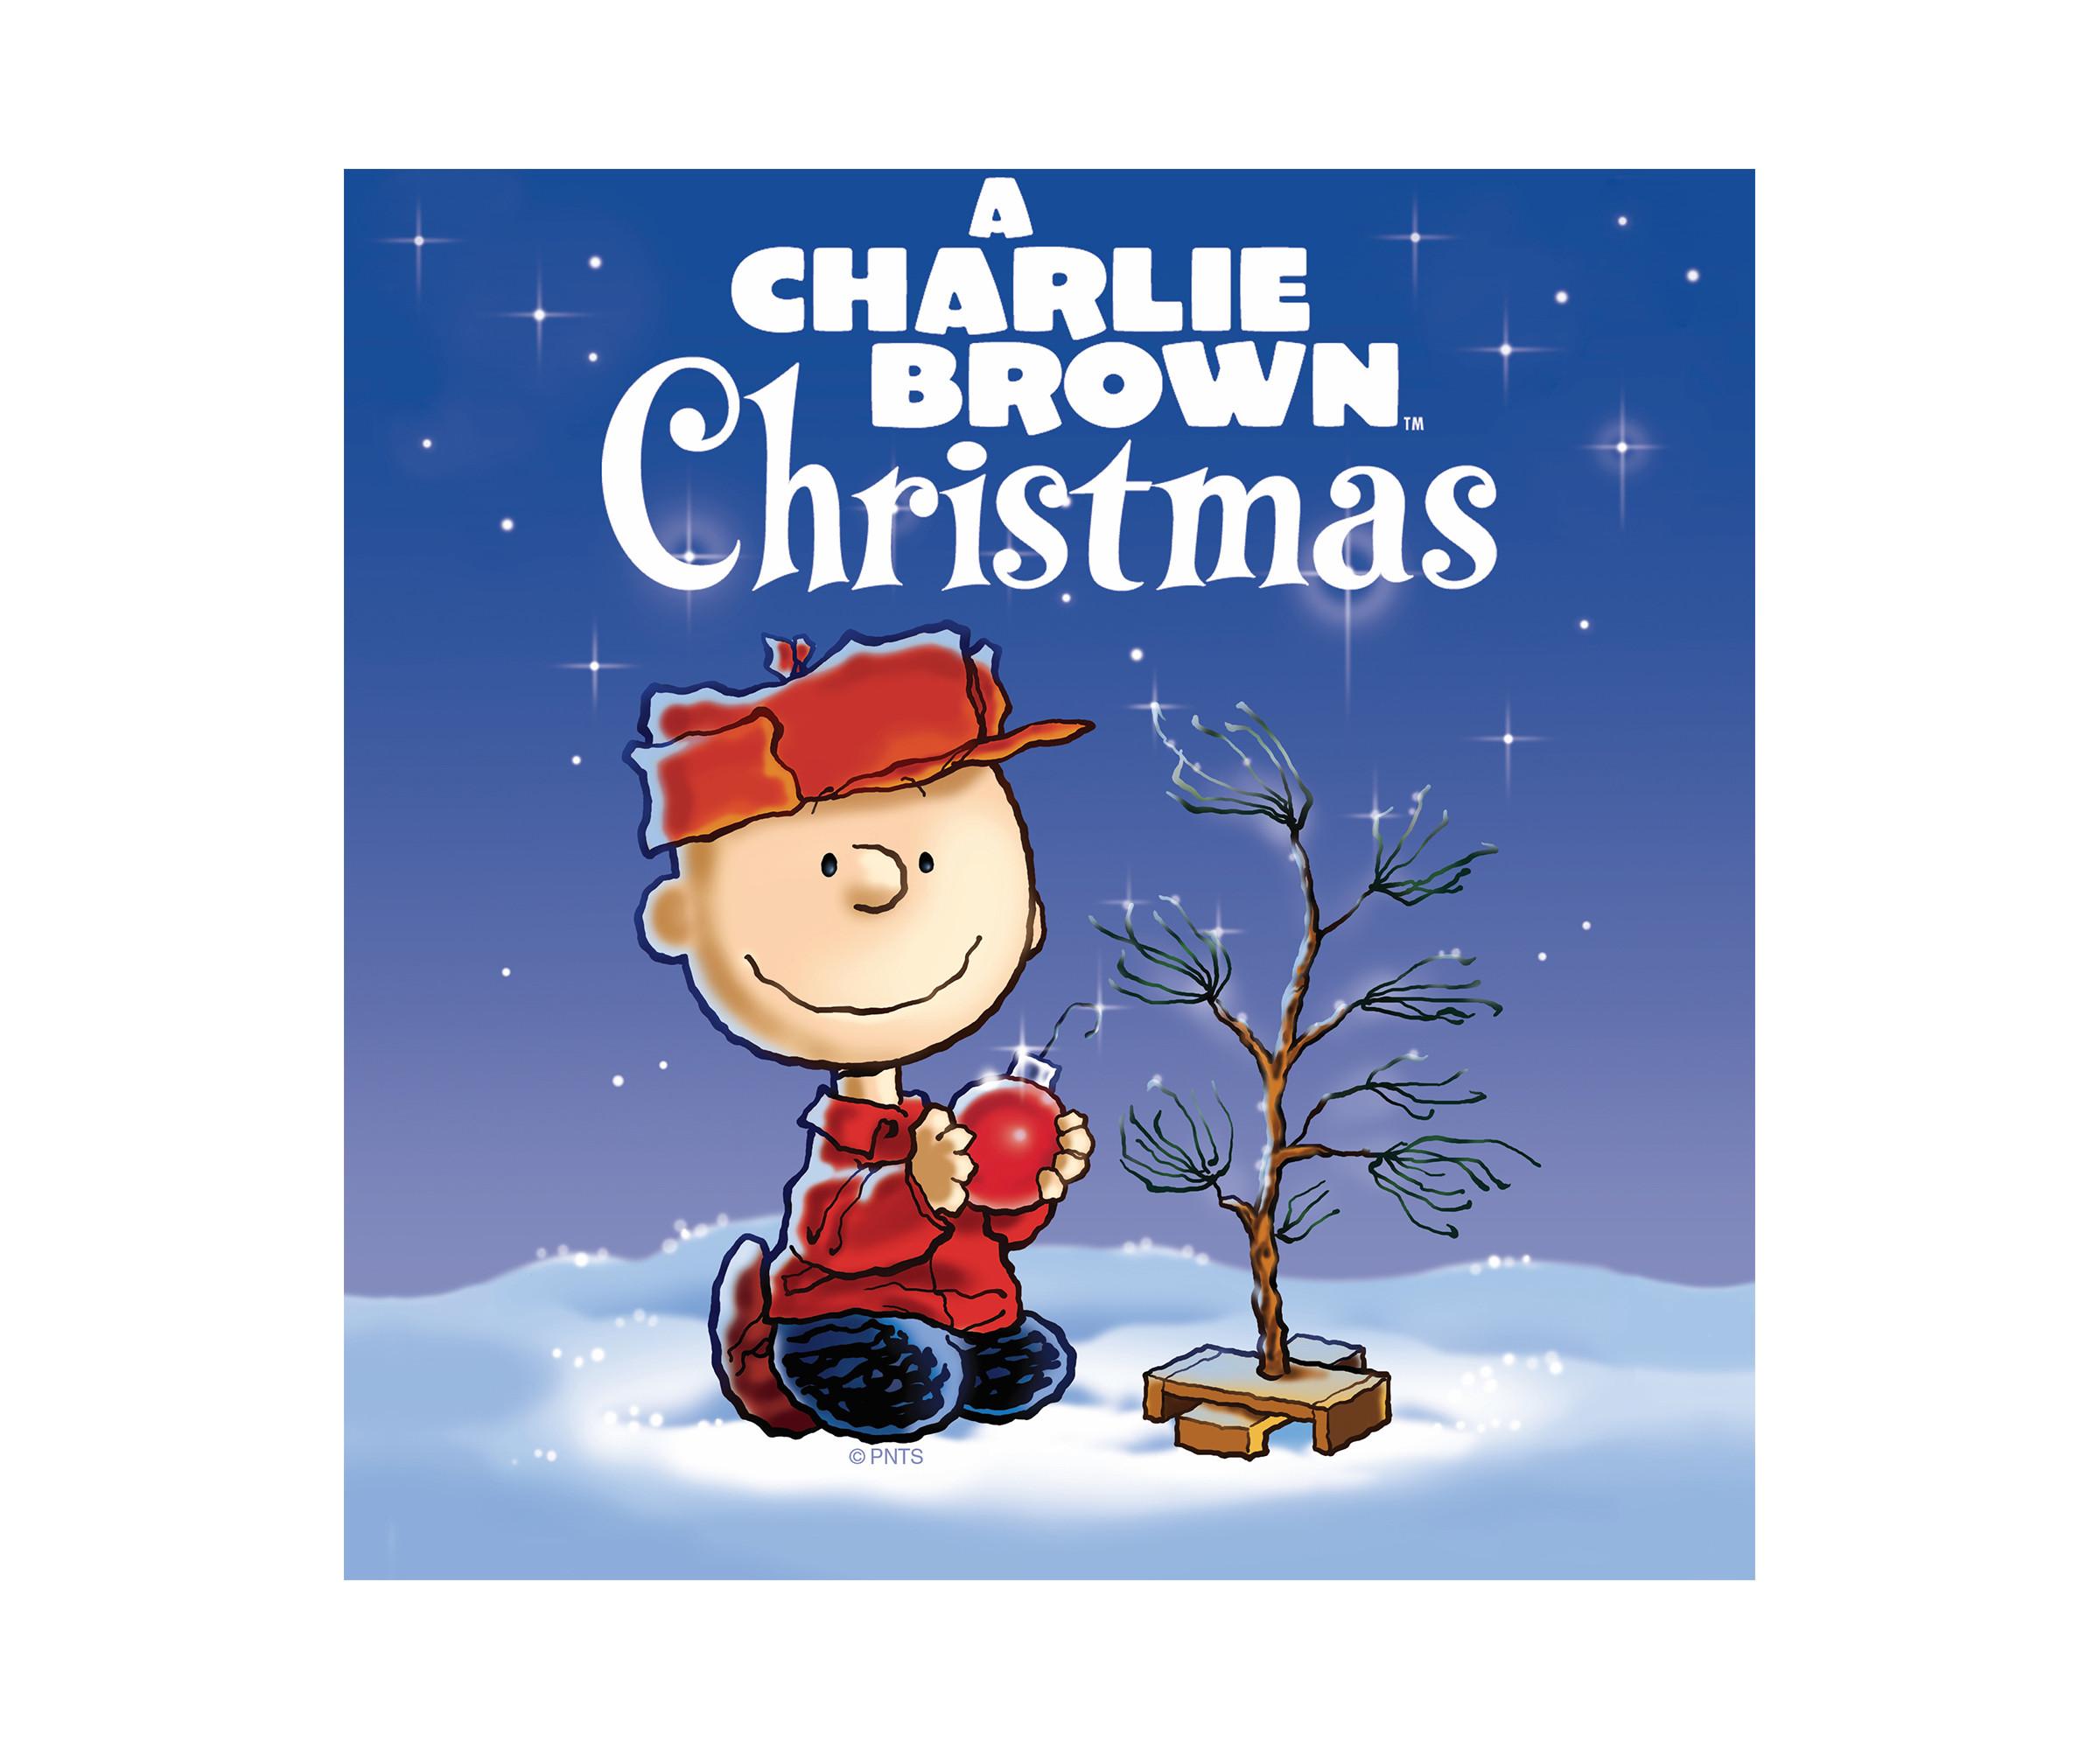 Charlie Brown Christmas Wallpaper Desktop (42+ images)